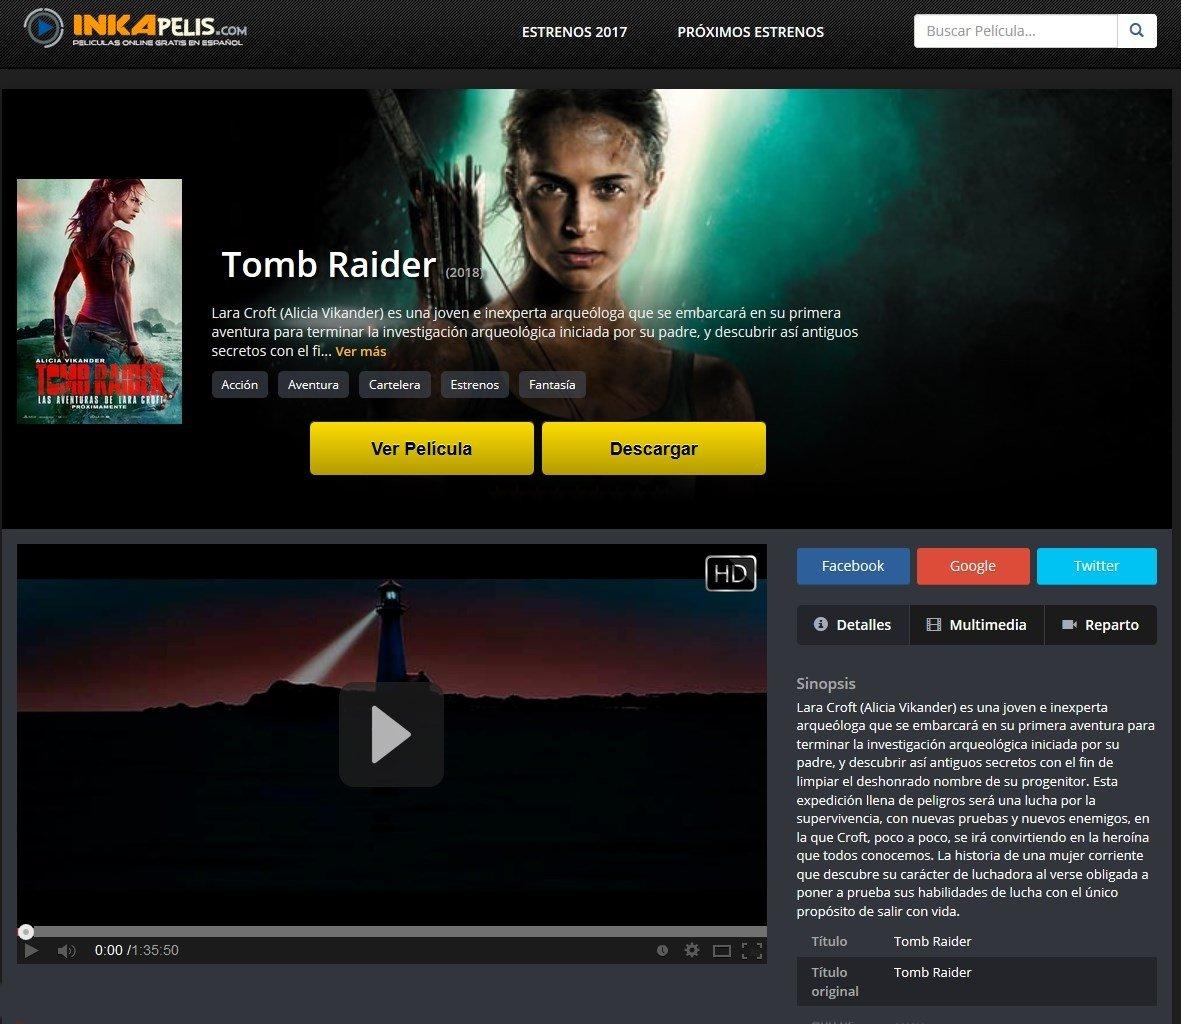 La última de Tomb Raider en Inkapelis